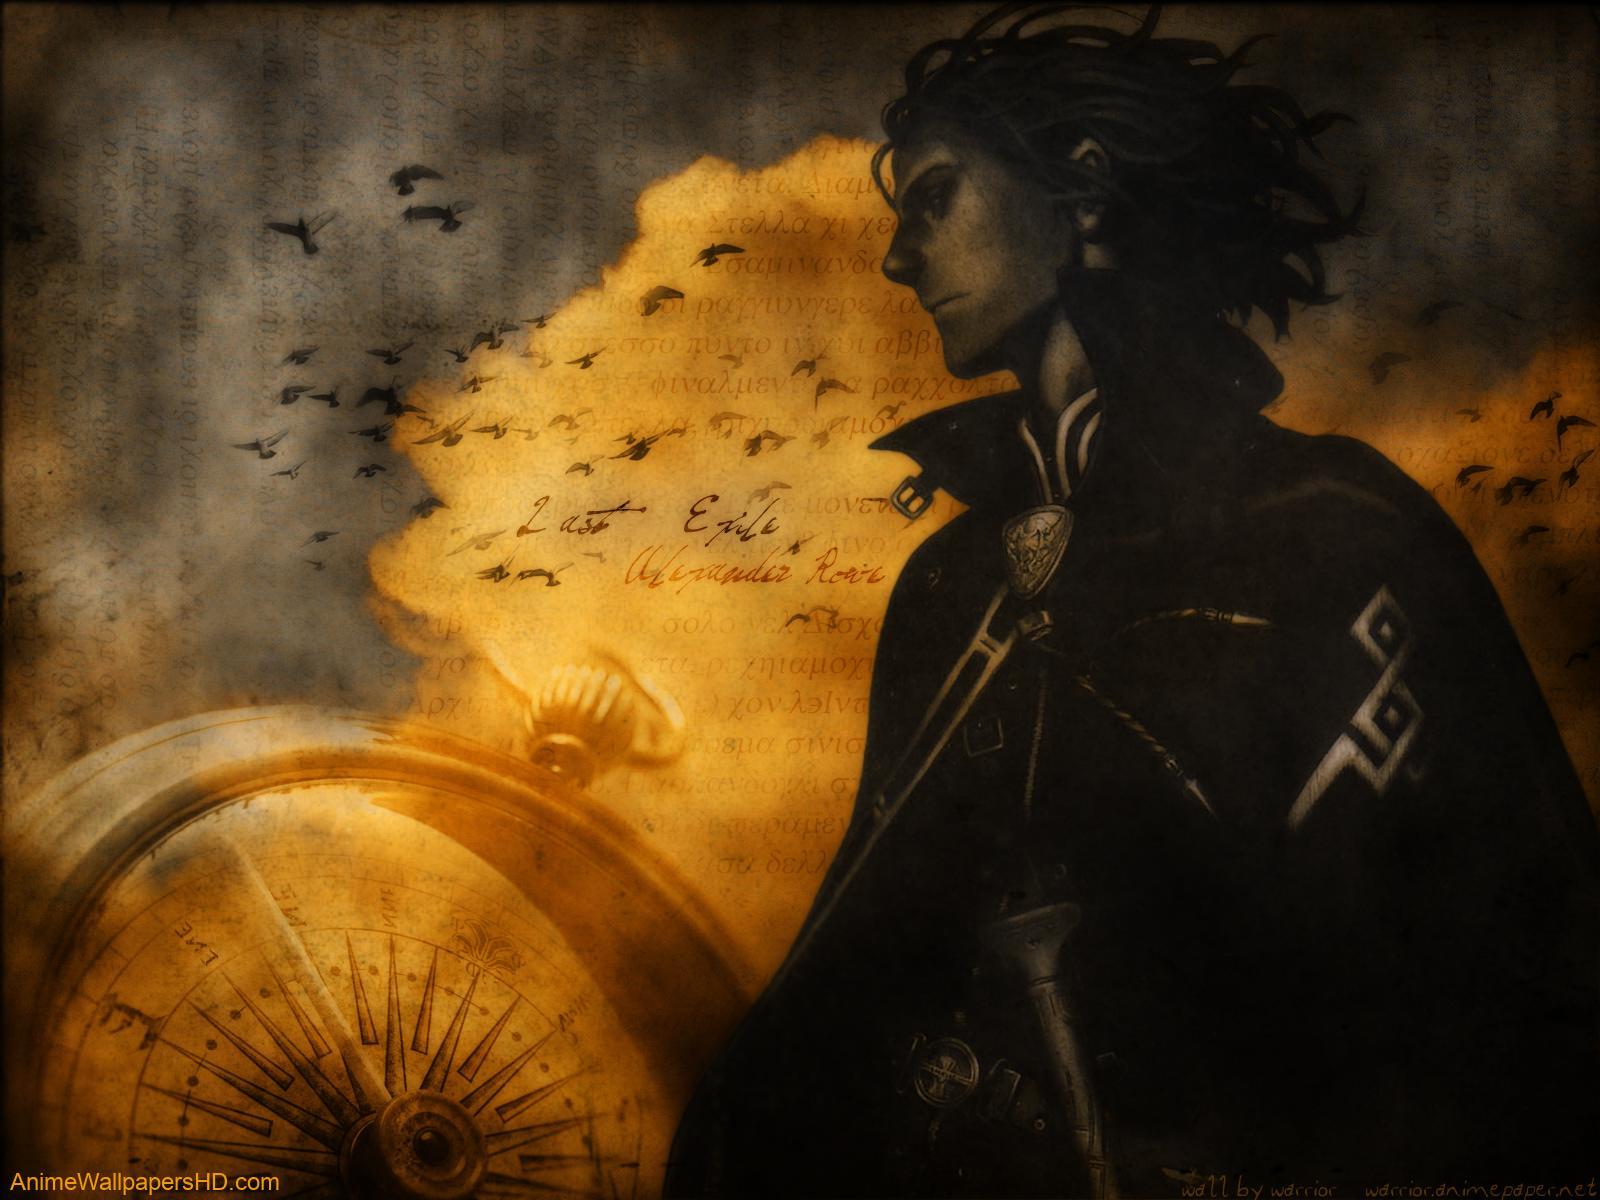 Download Last Exile wallpaper Anime Last Exile 28913 1600x1200